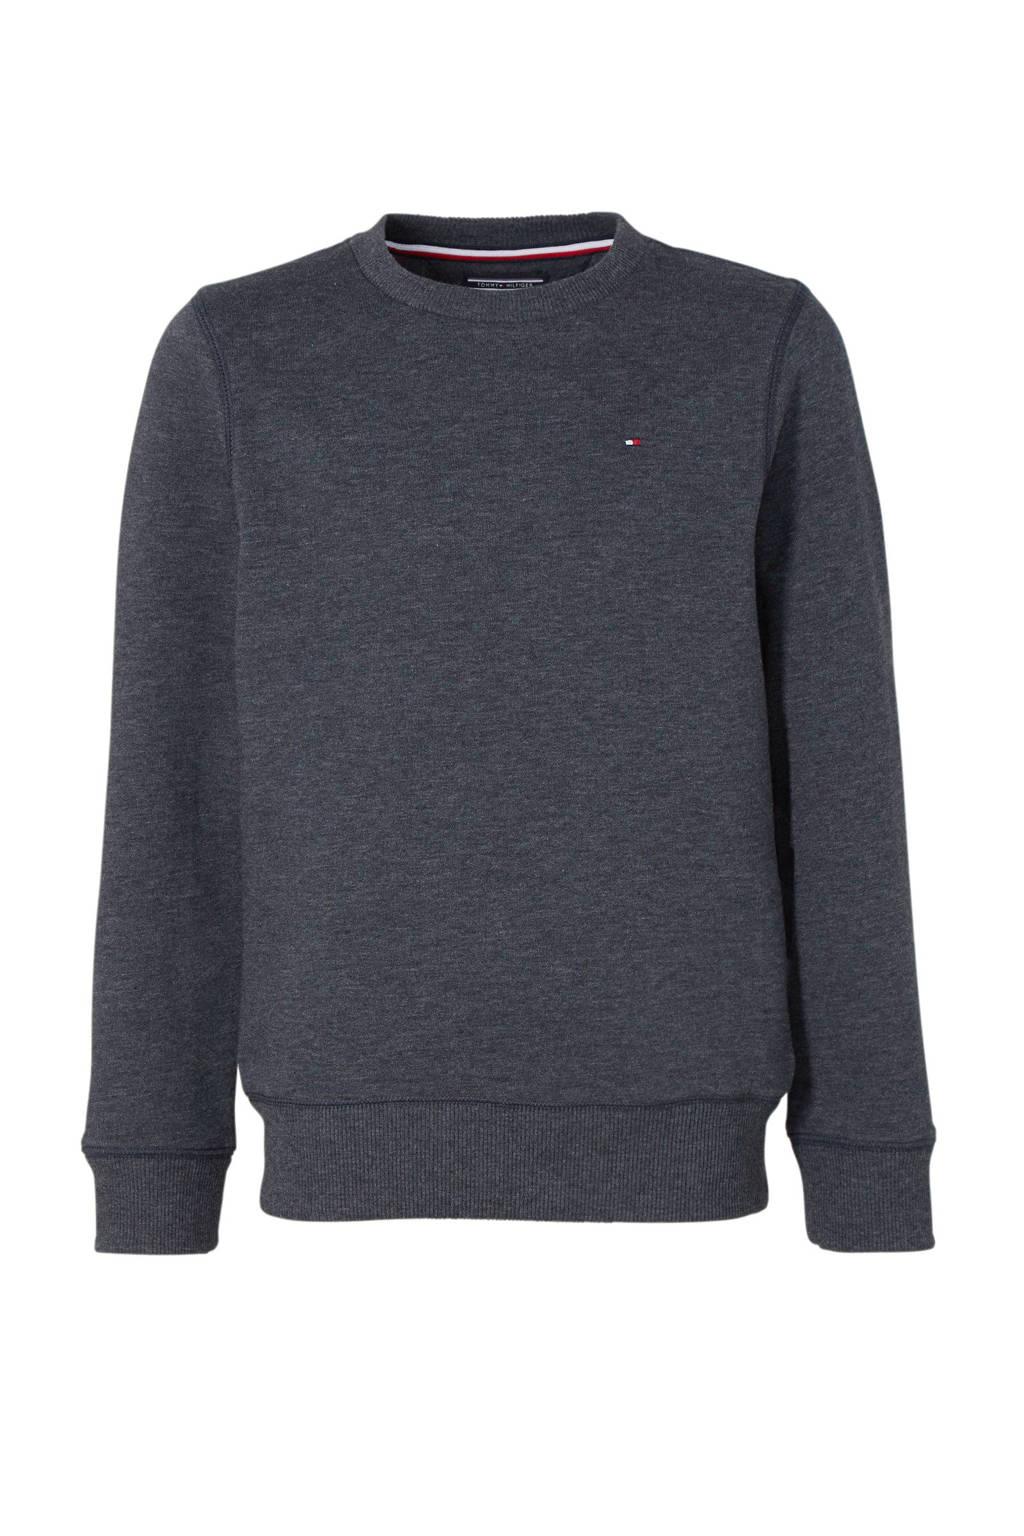 Tommy Hilfiger sweater donkerblauw, Donkerblauw melange